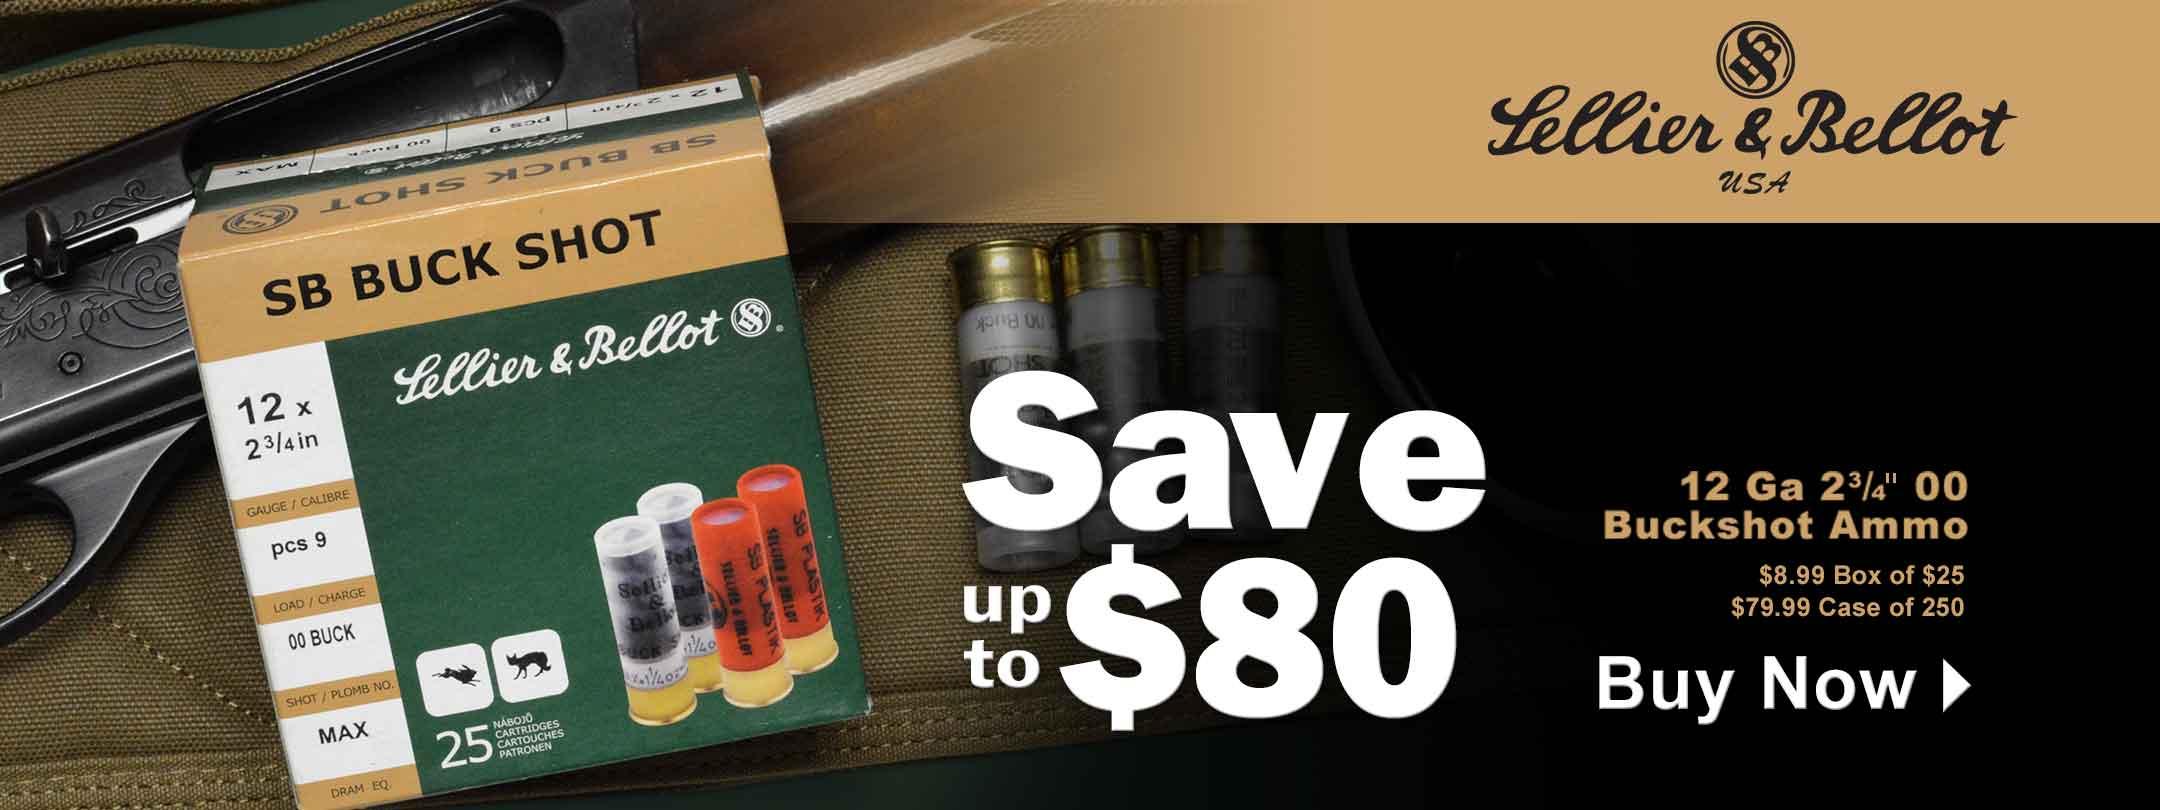 Hot Buy - Save up to $80 Sellier & Bellot 12 Ga 00 Buckshot Ammo